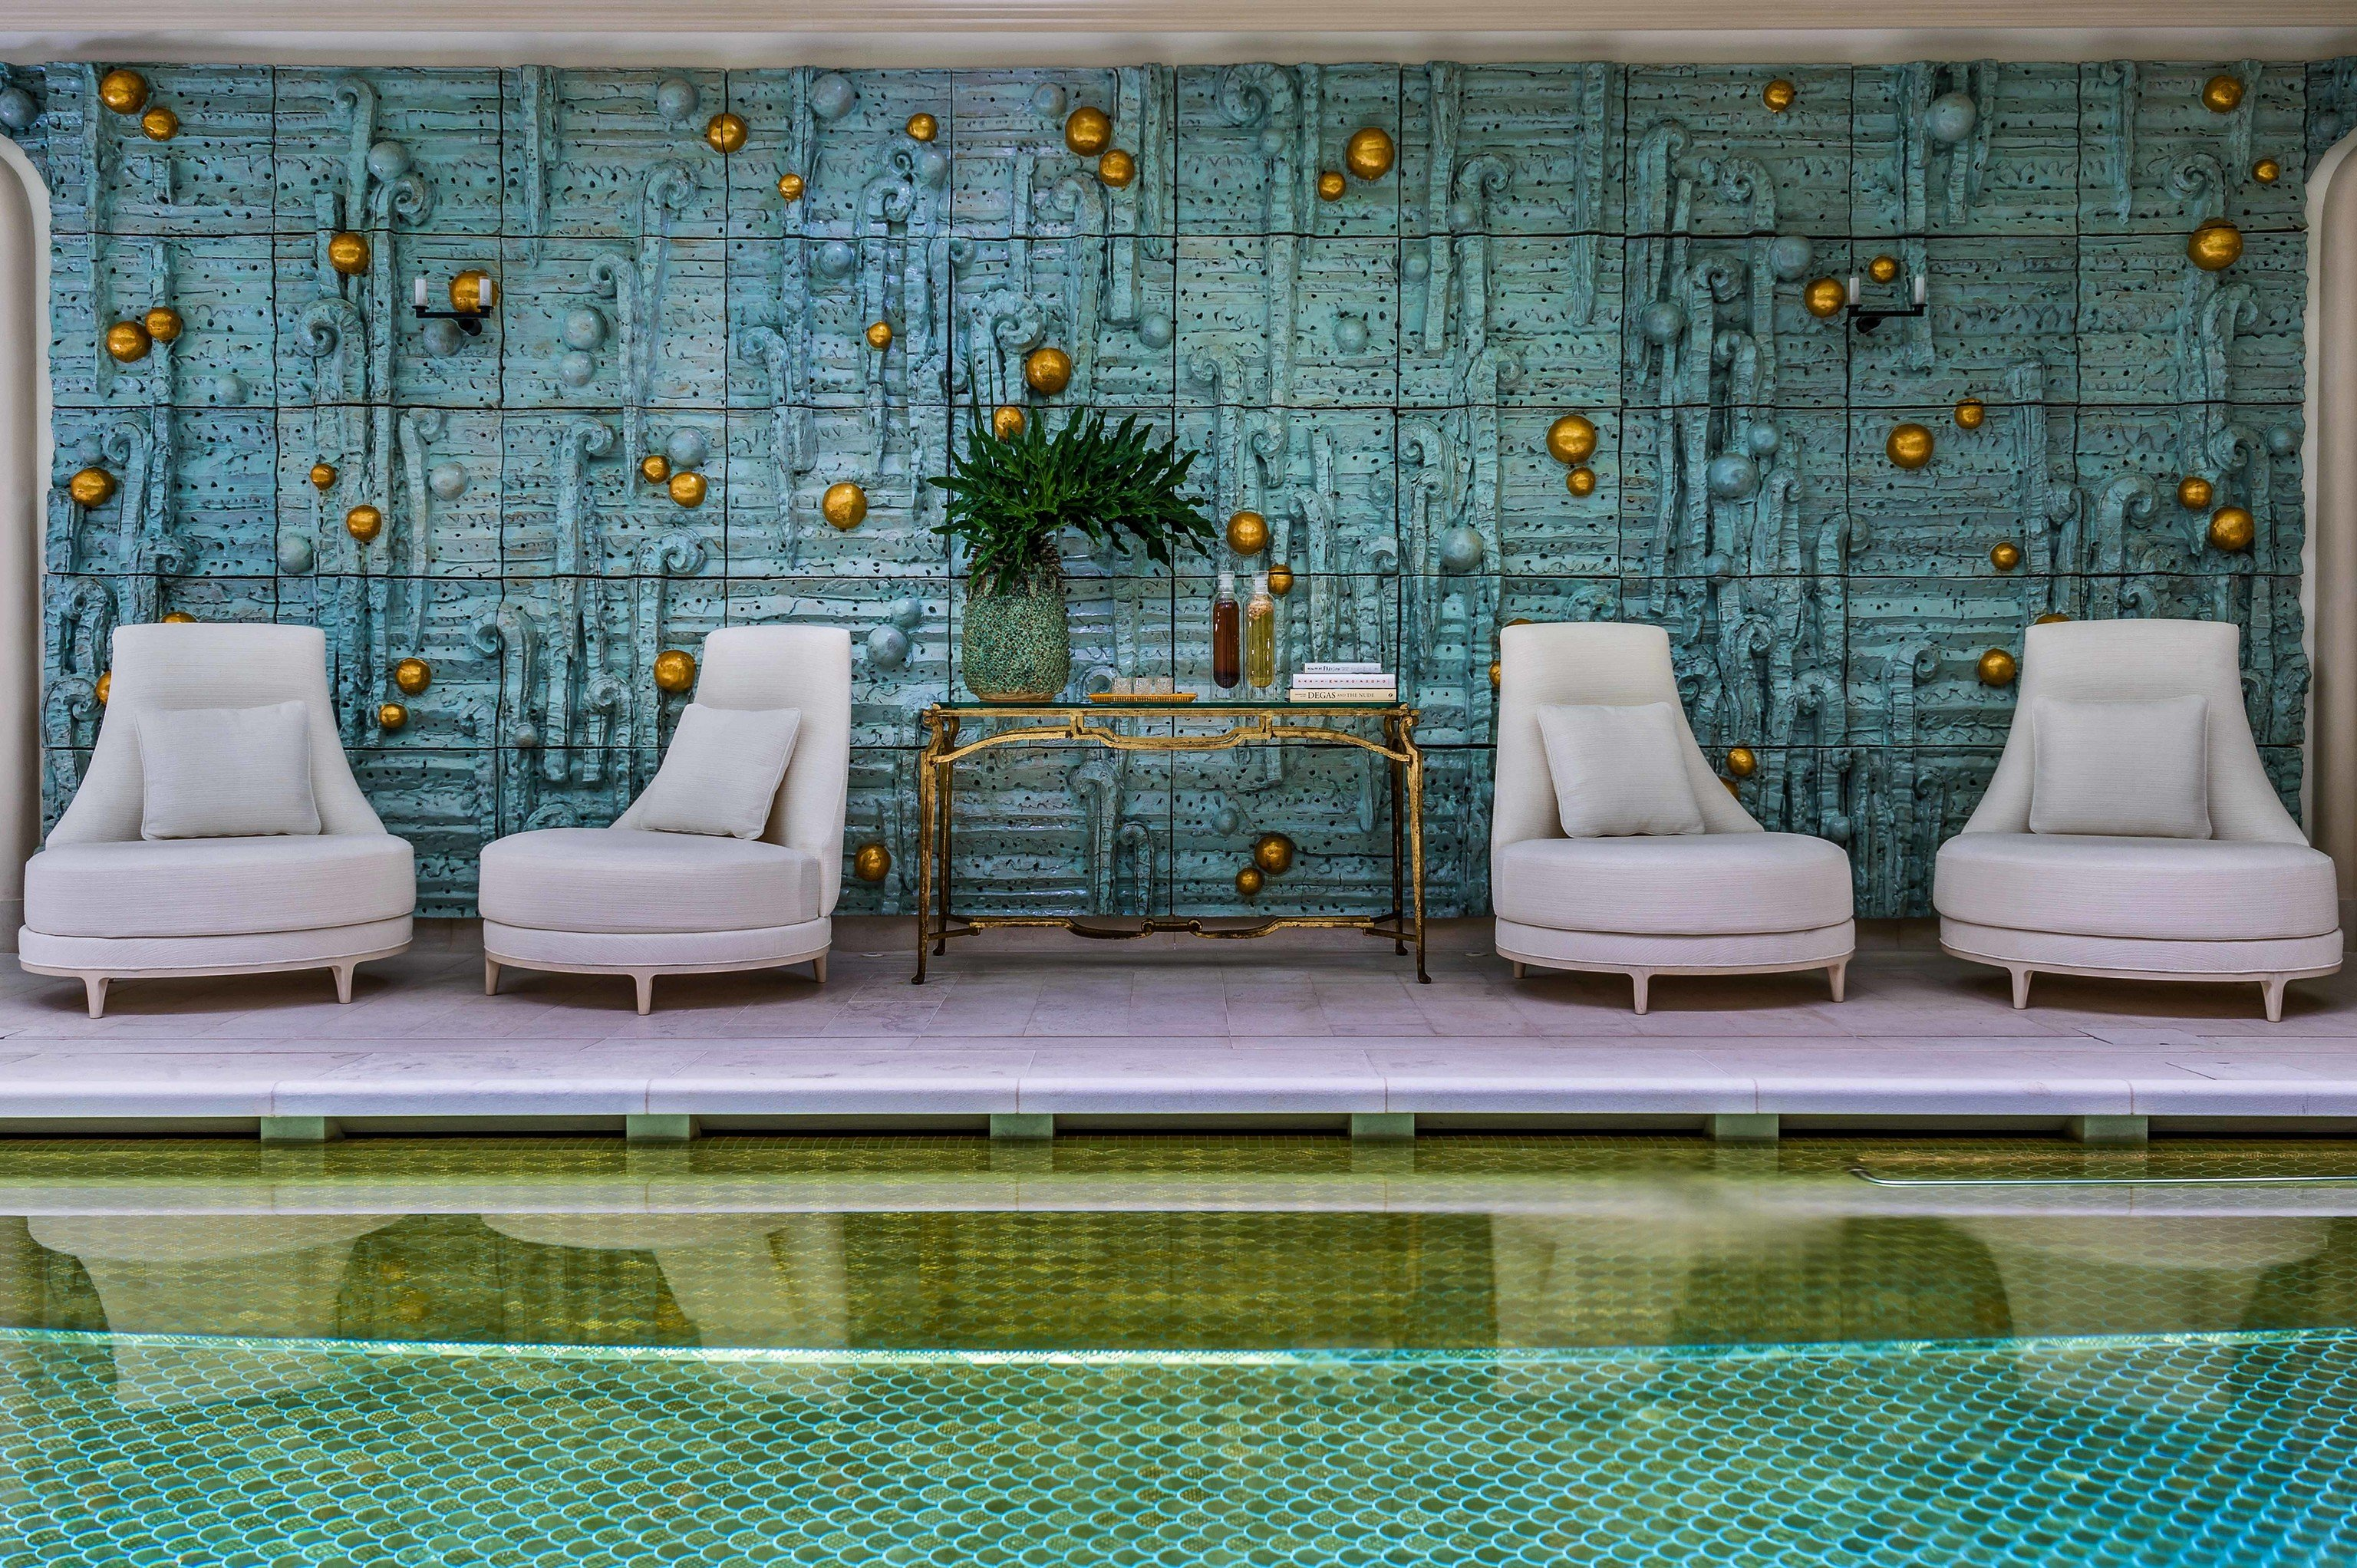 chair home swimming pool flooring